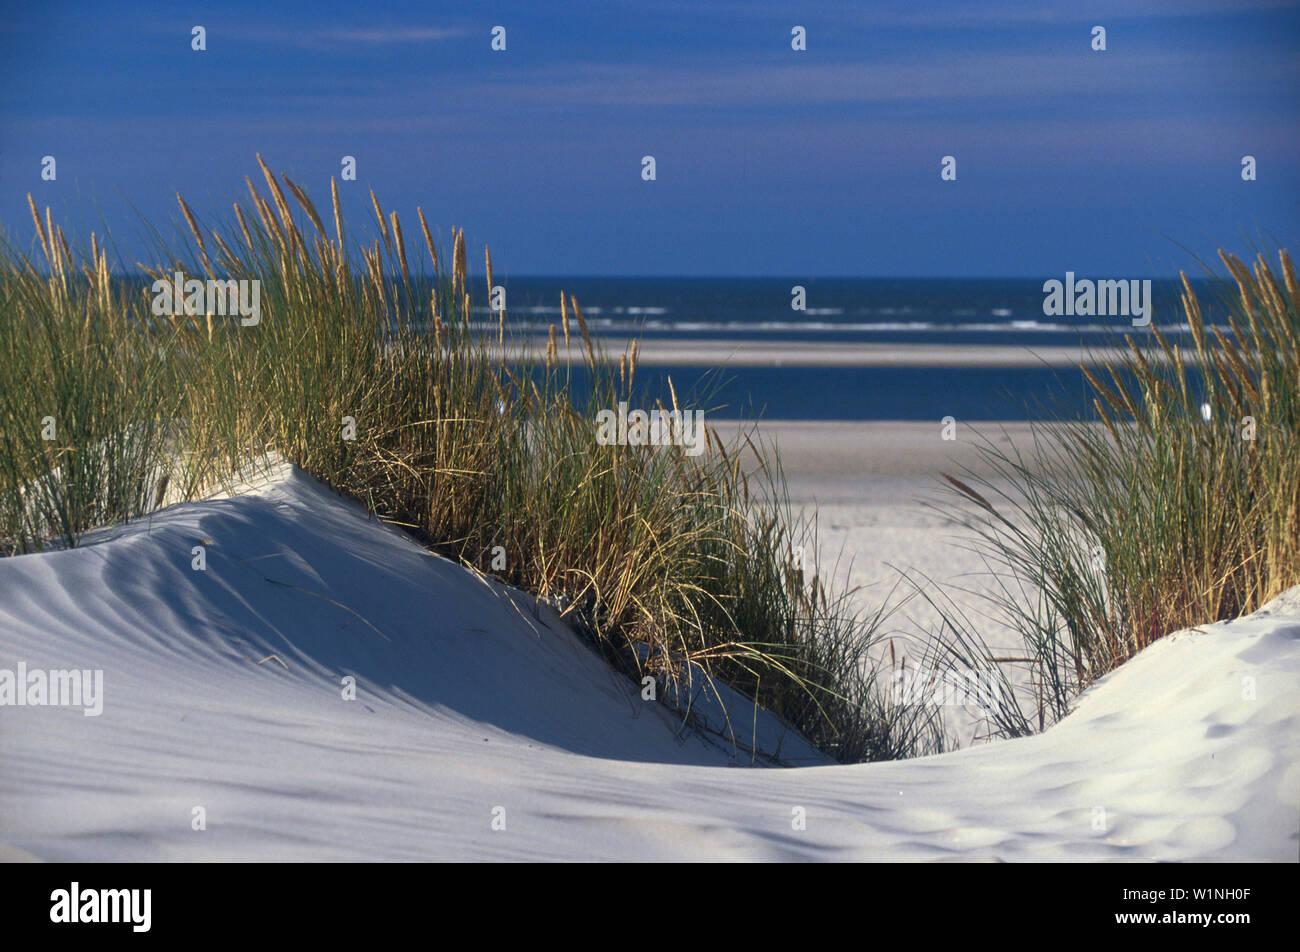 Duenen, Nordsee, Niedersachsen Deutschland - Stock Image